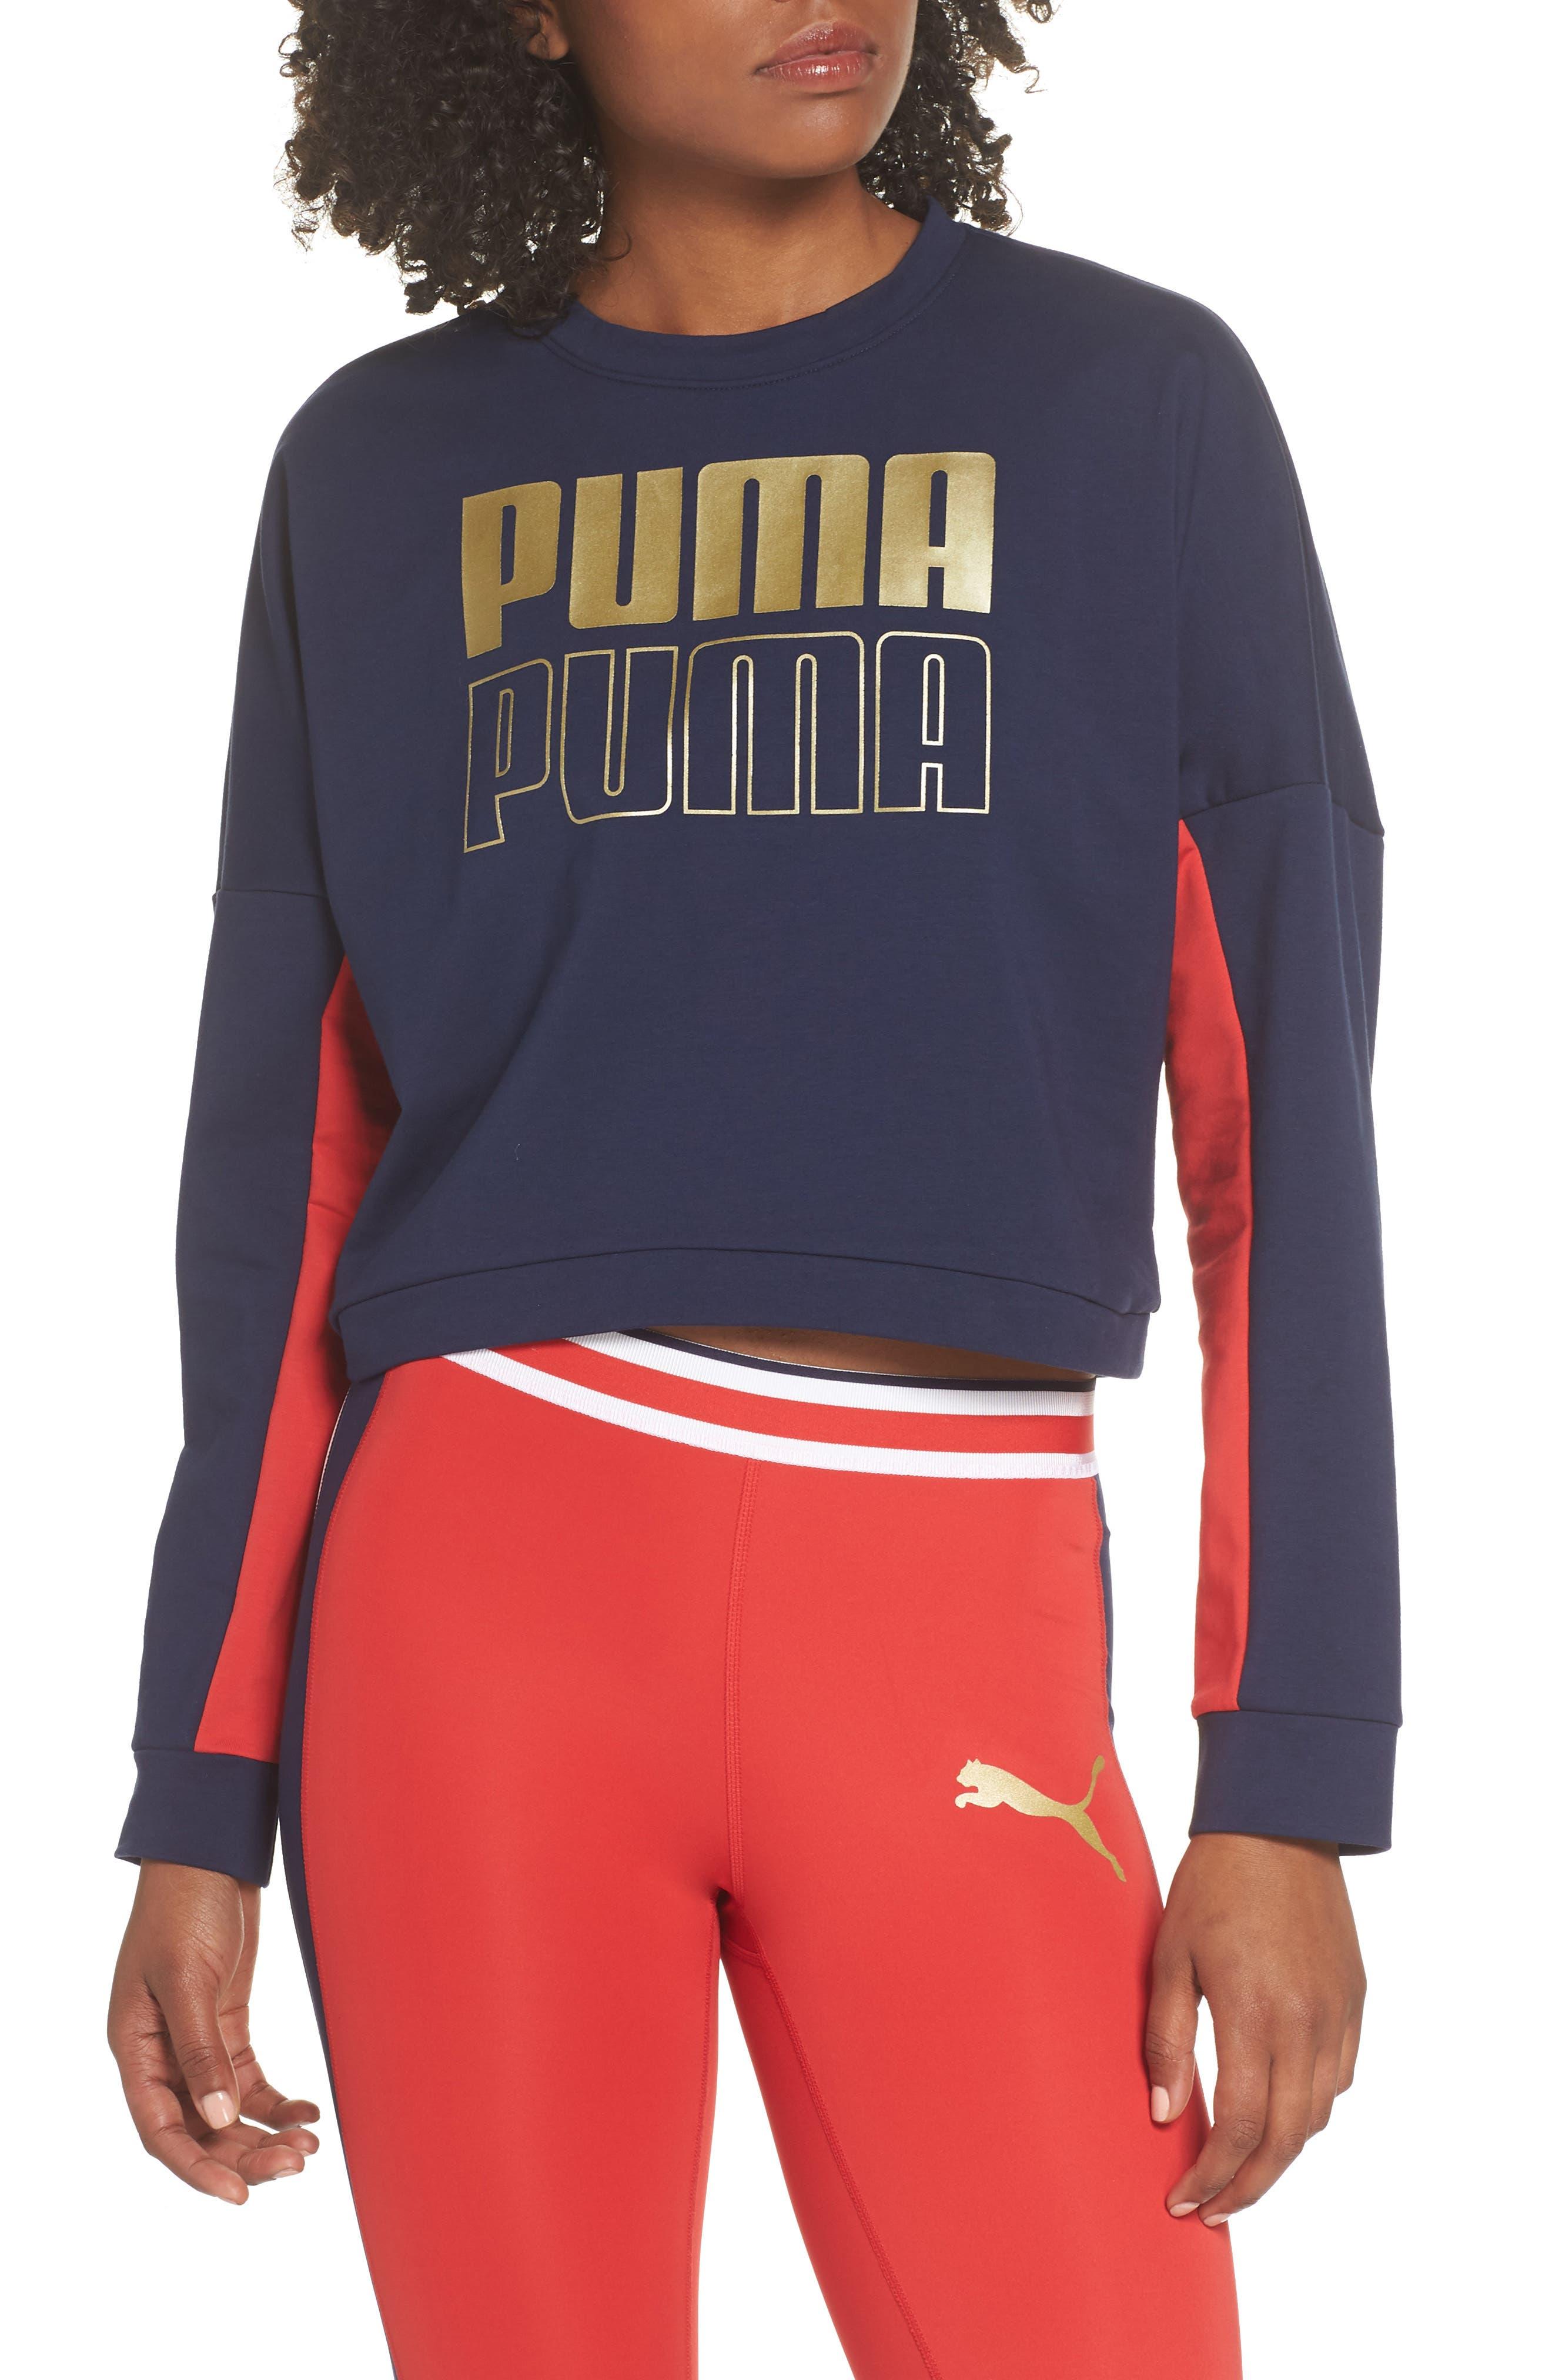 Modern Sport Sweatshirt,                         Main,                         color, 710